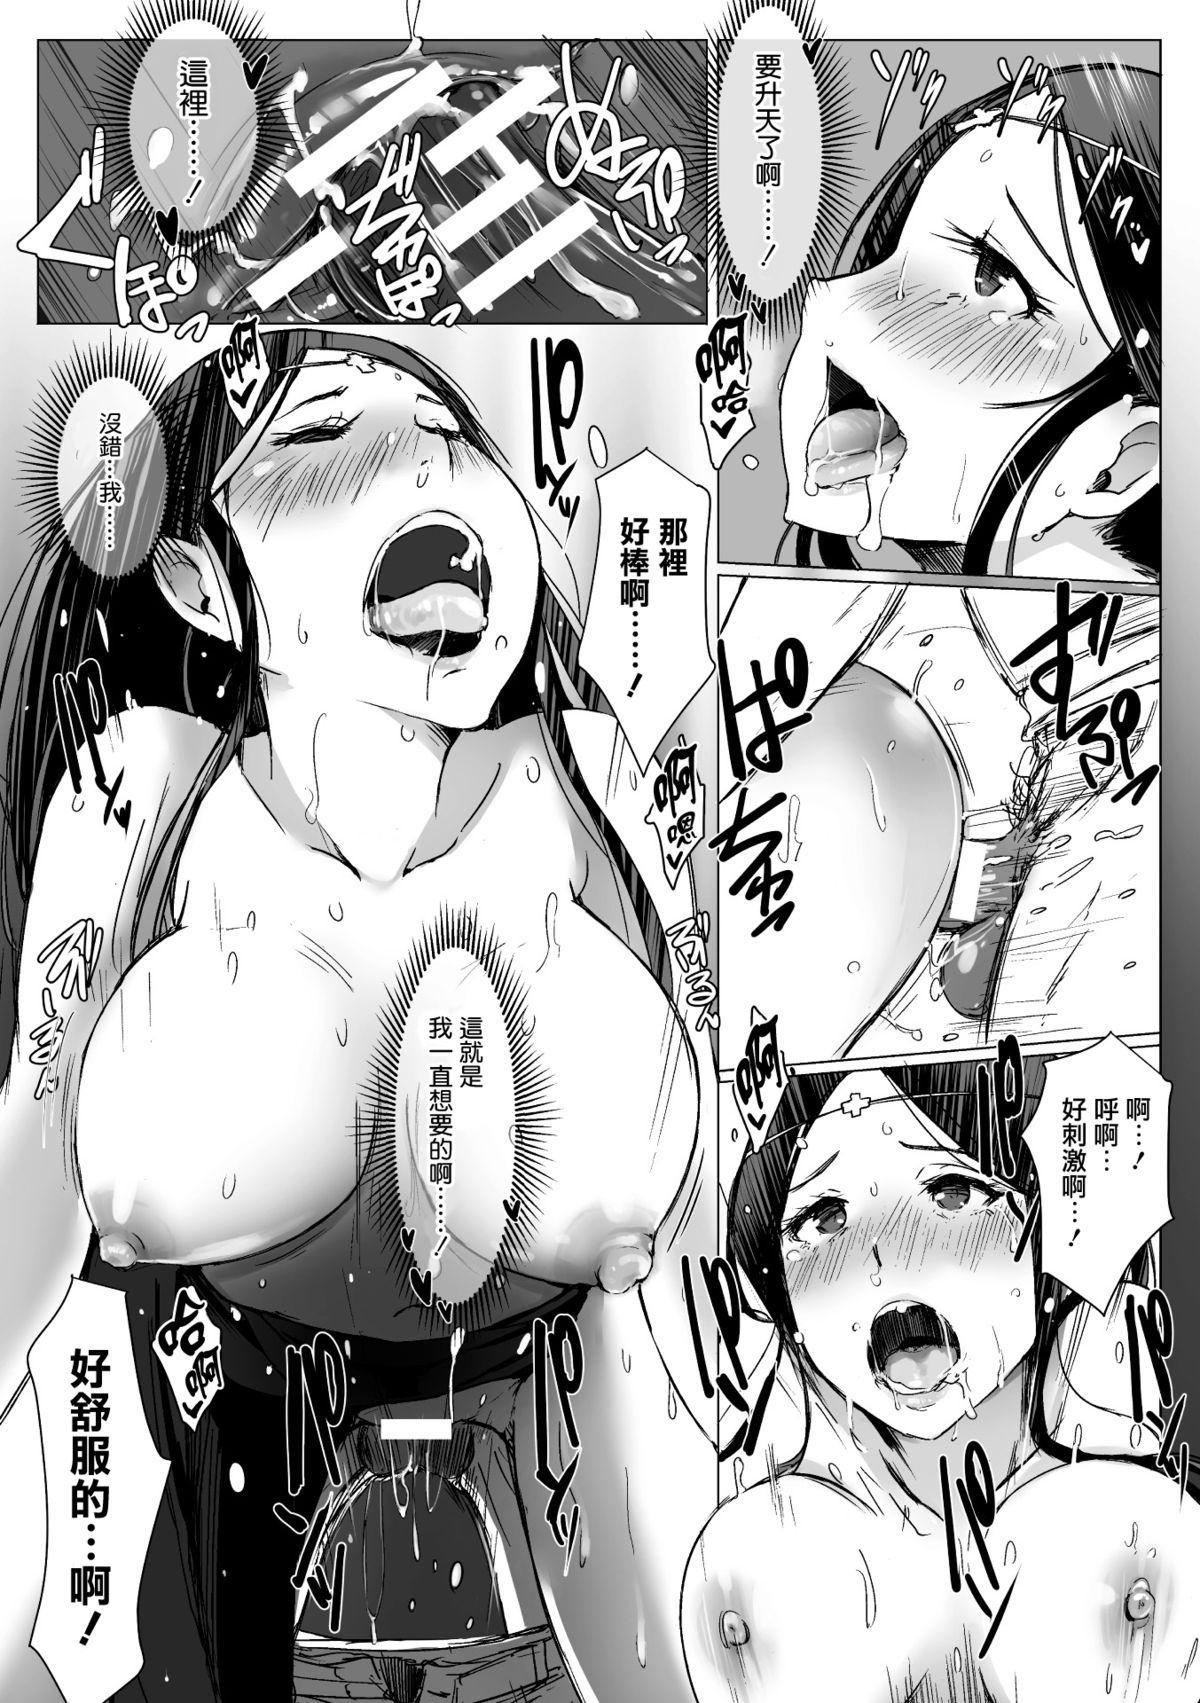 Yamaneko Kishidan Monogatari Onna Kishi Irina Dainiwa 23